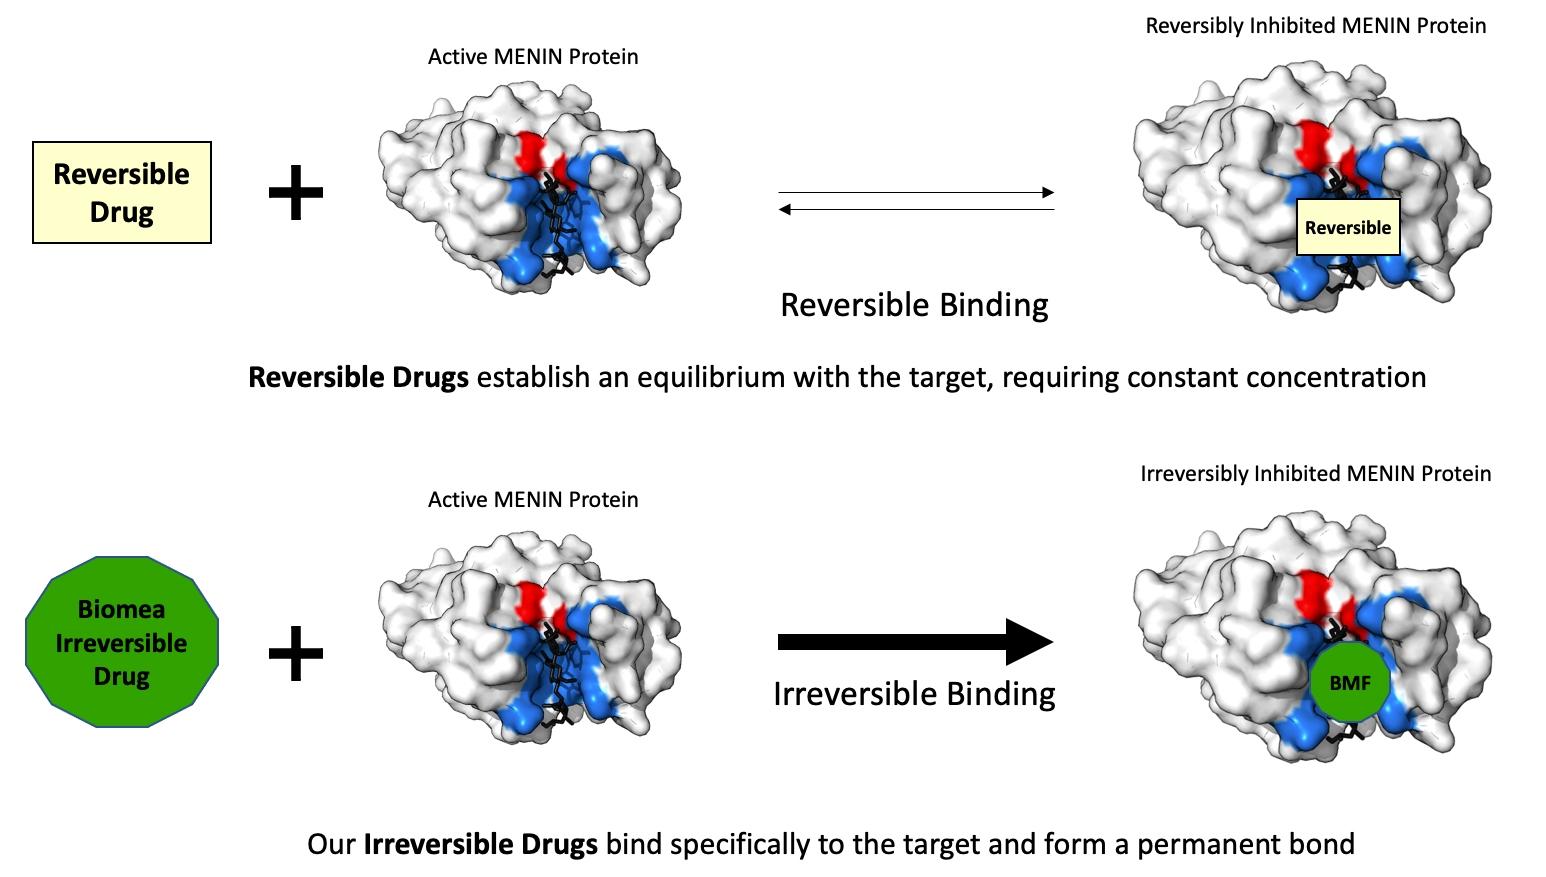 Biomea Fusion Irreversible Drub